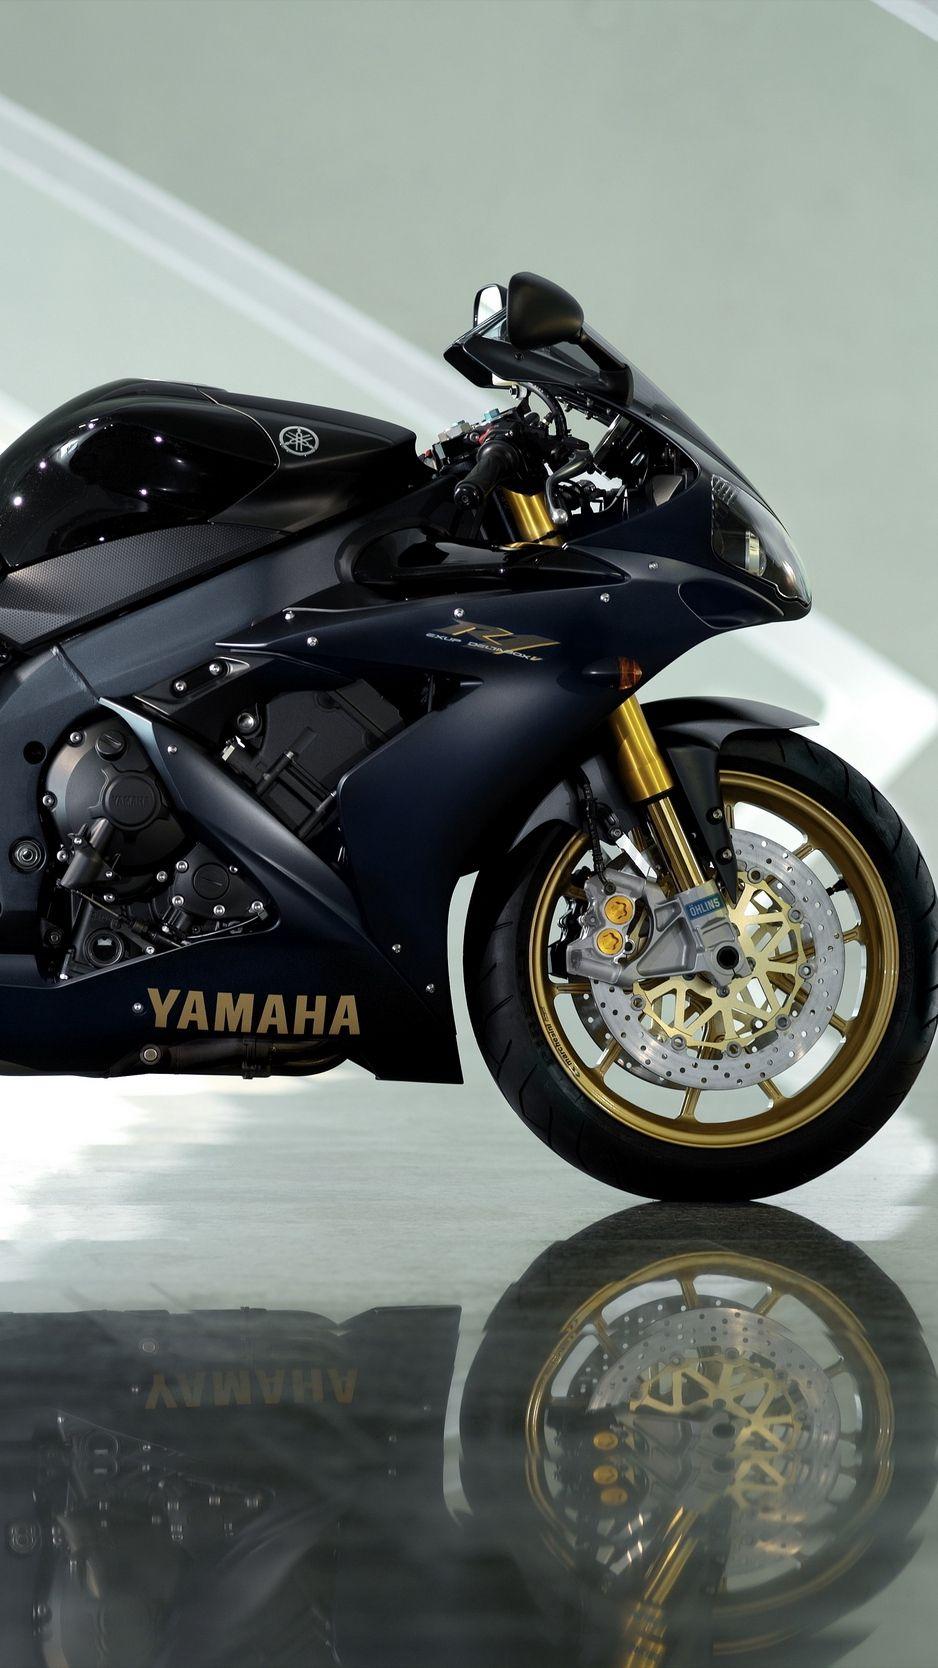 Yamaha Motorcycles HD iPhone Wallpapers - Wallpaper Cave